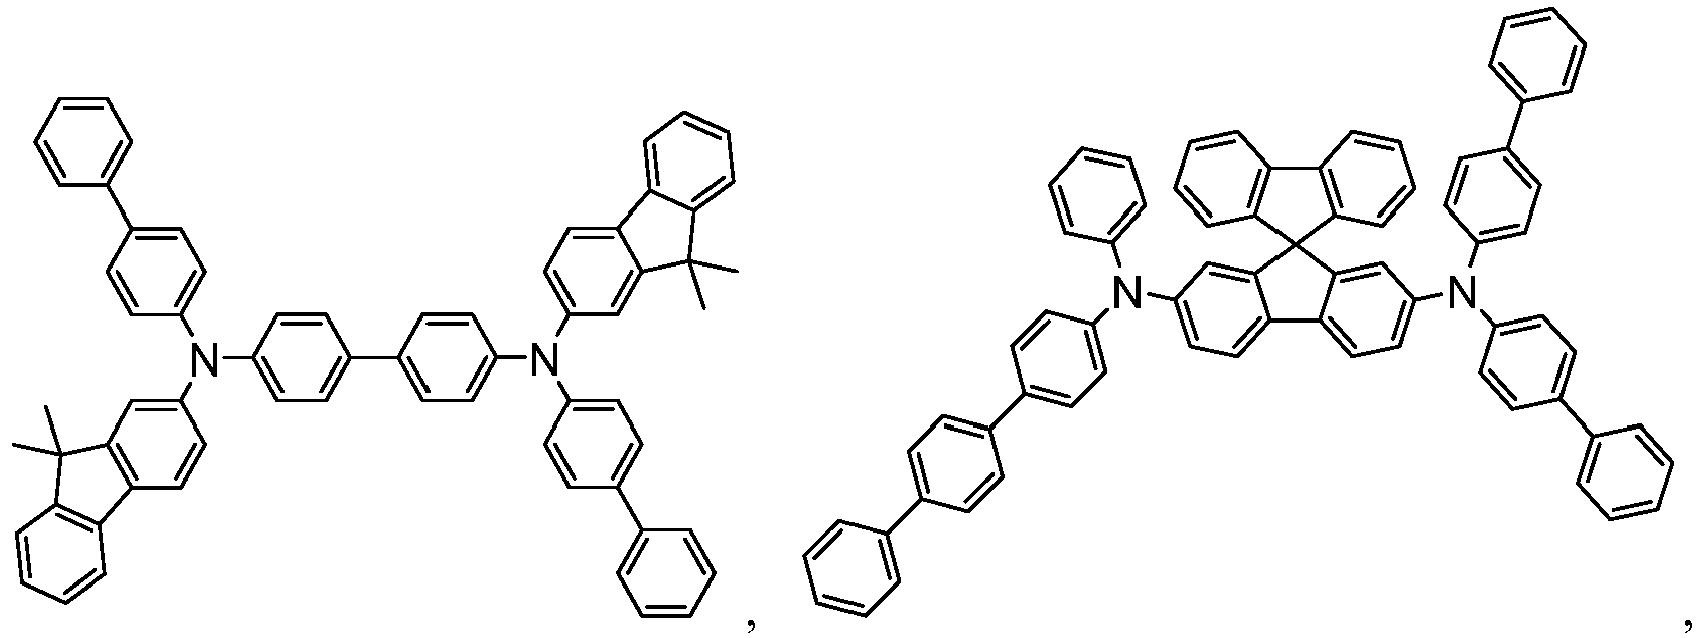 Figure imgb0867